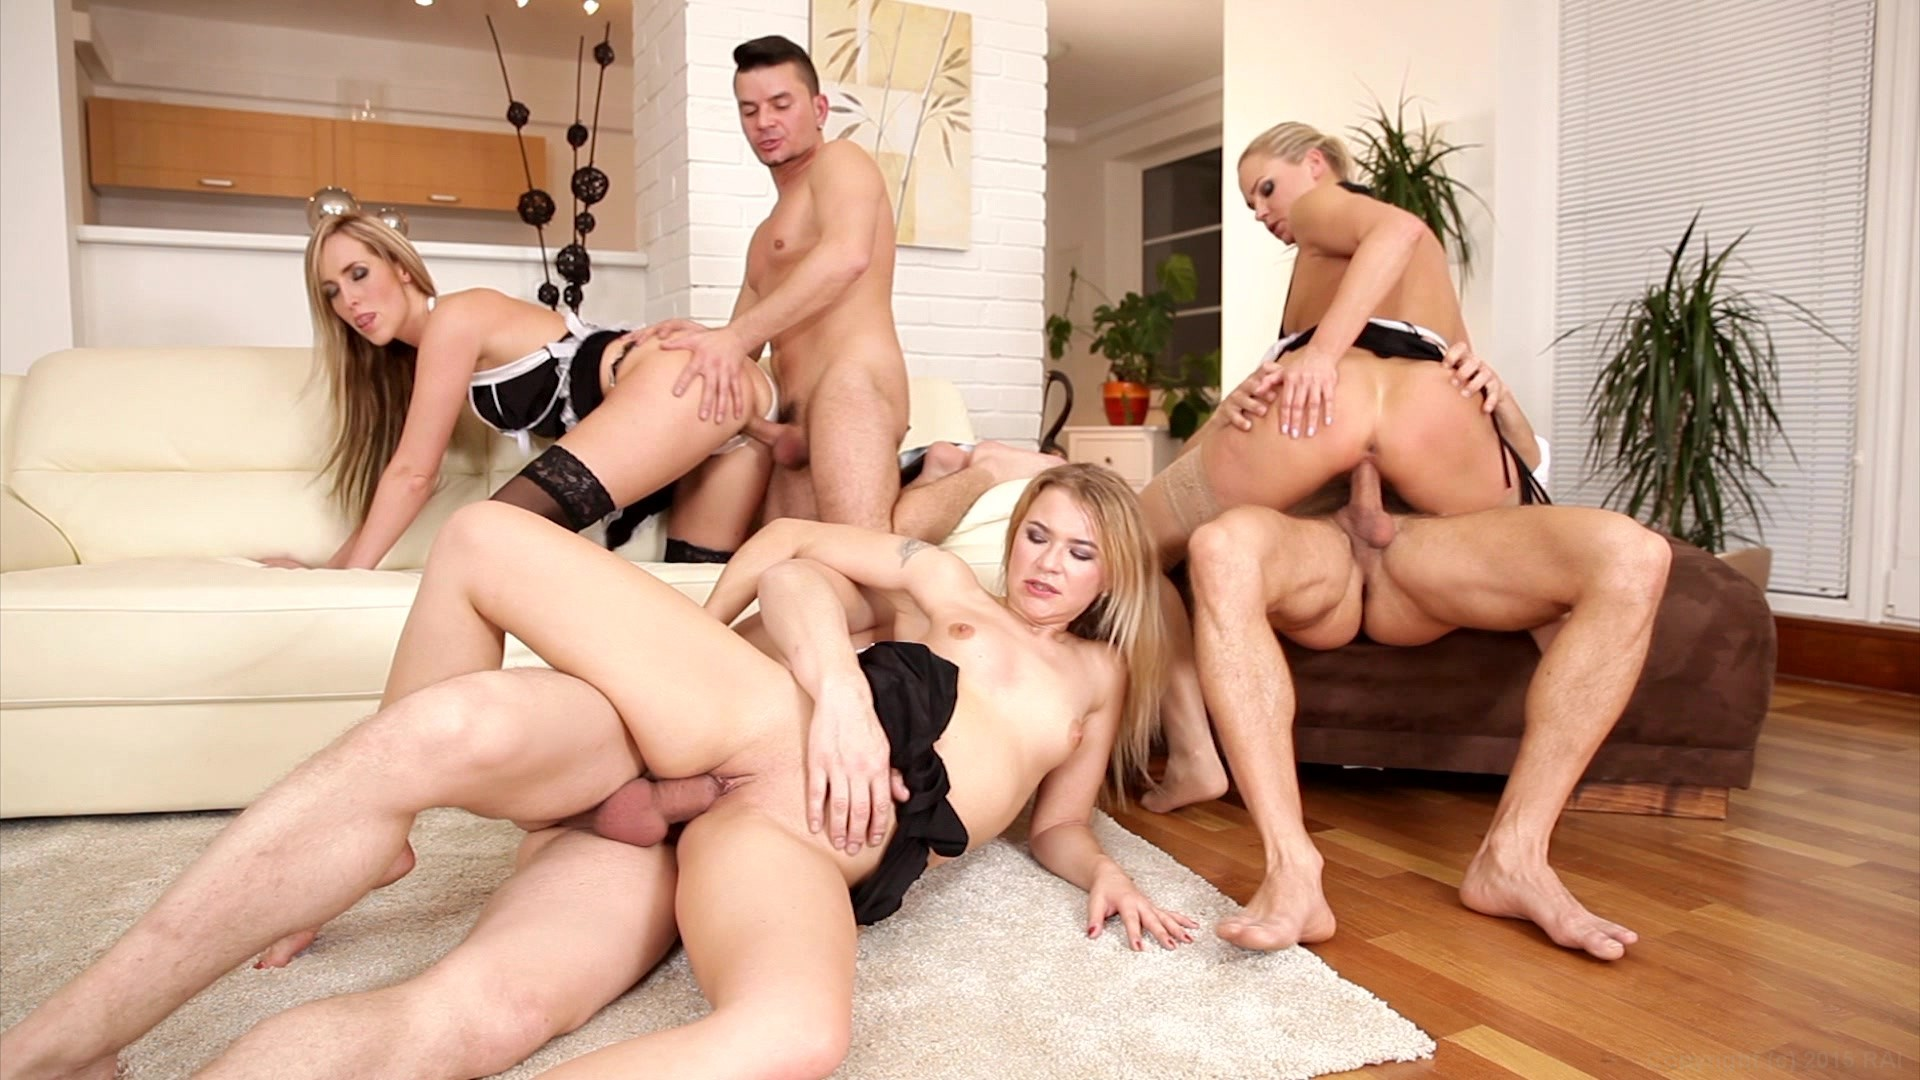 Toe Sucking Swinger With Girls Trampling